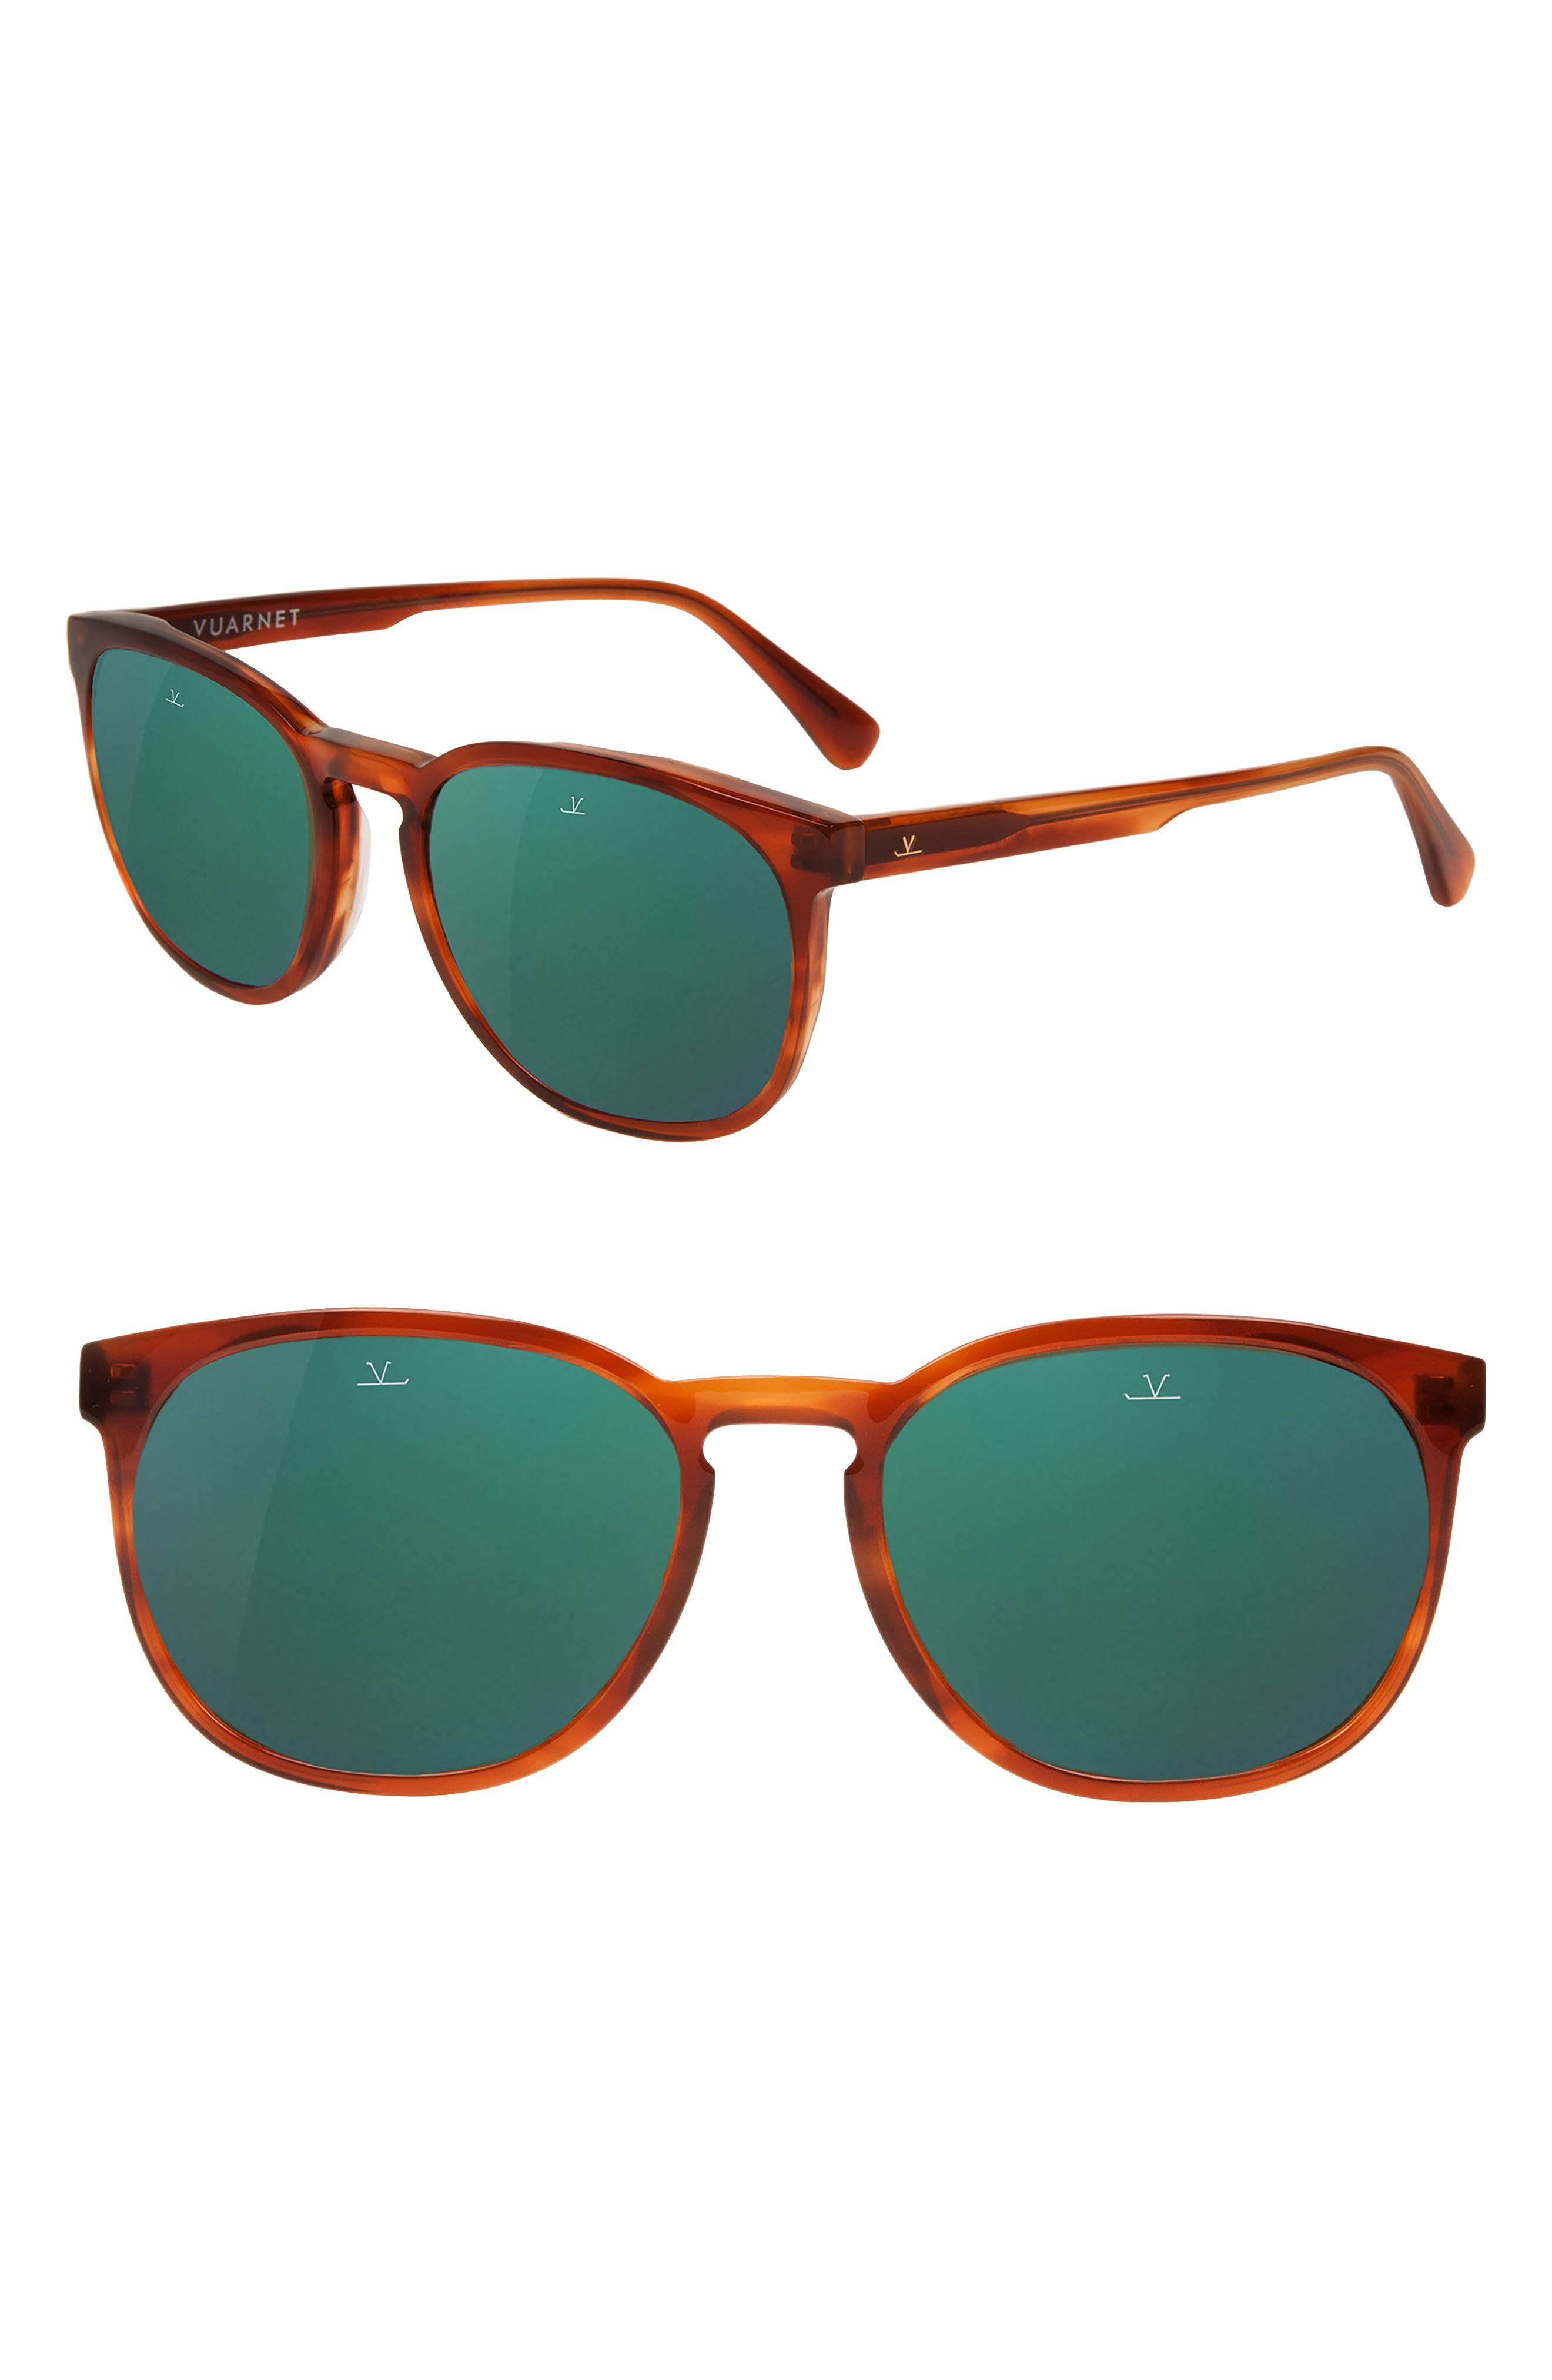 District 54mm Sunglasses,                             Main thumbnail 1, color,                             HONEY STRIPES